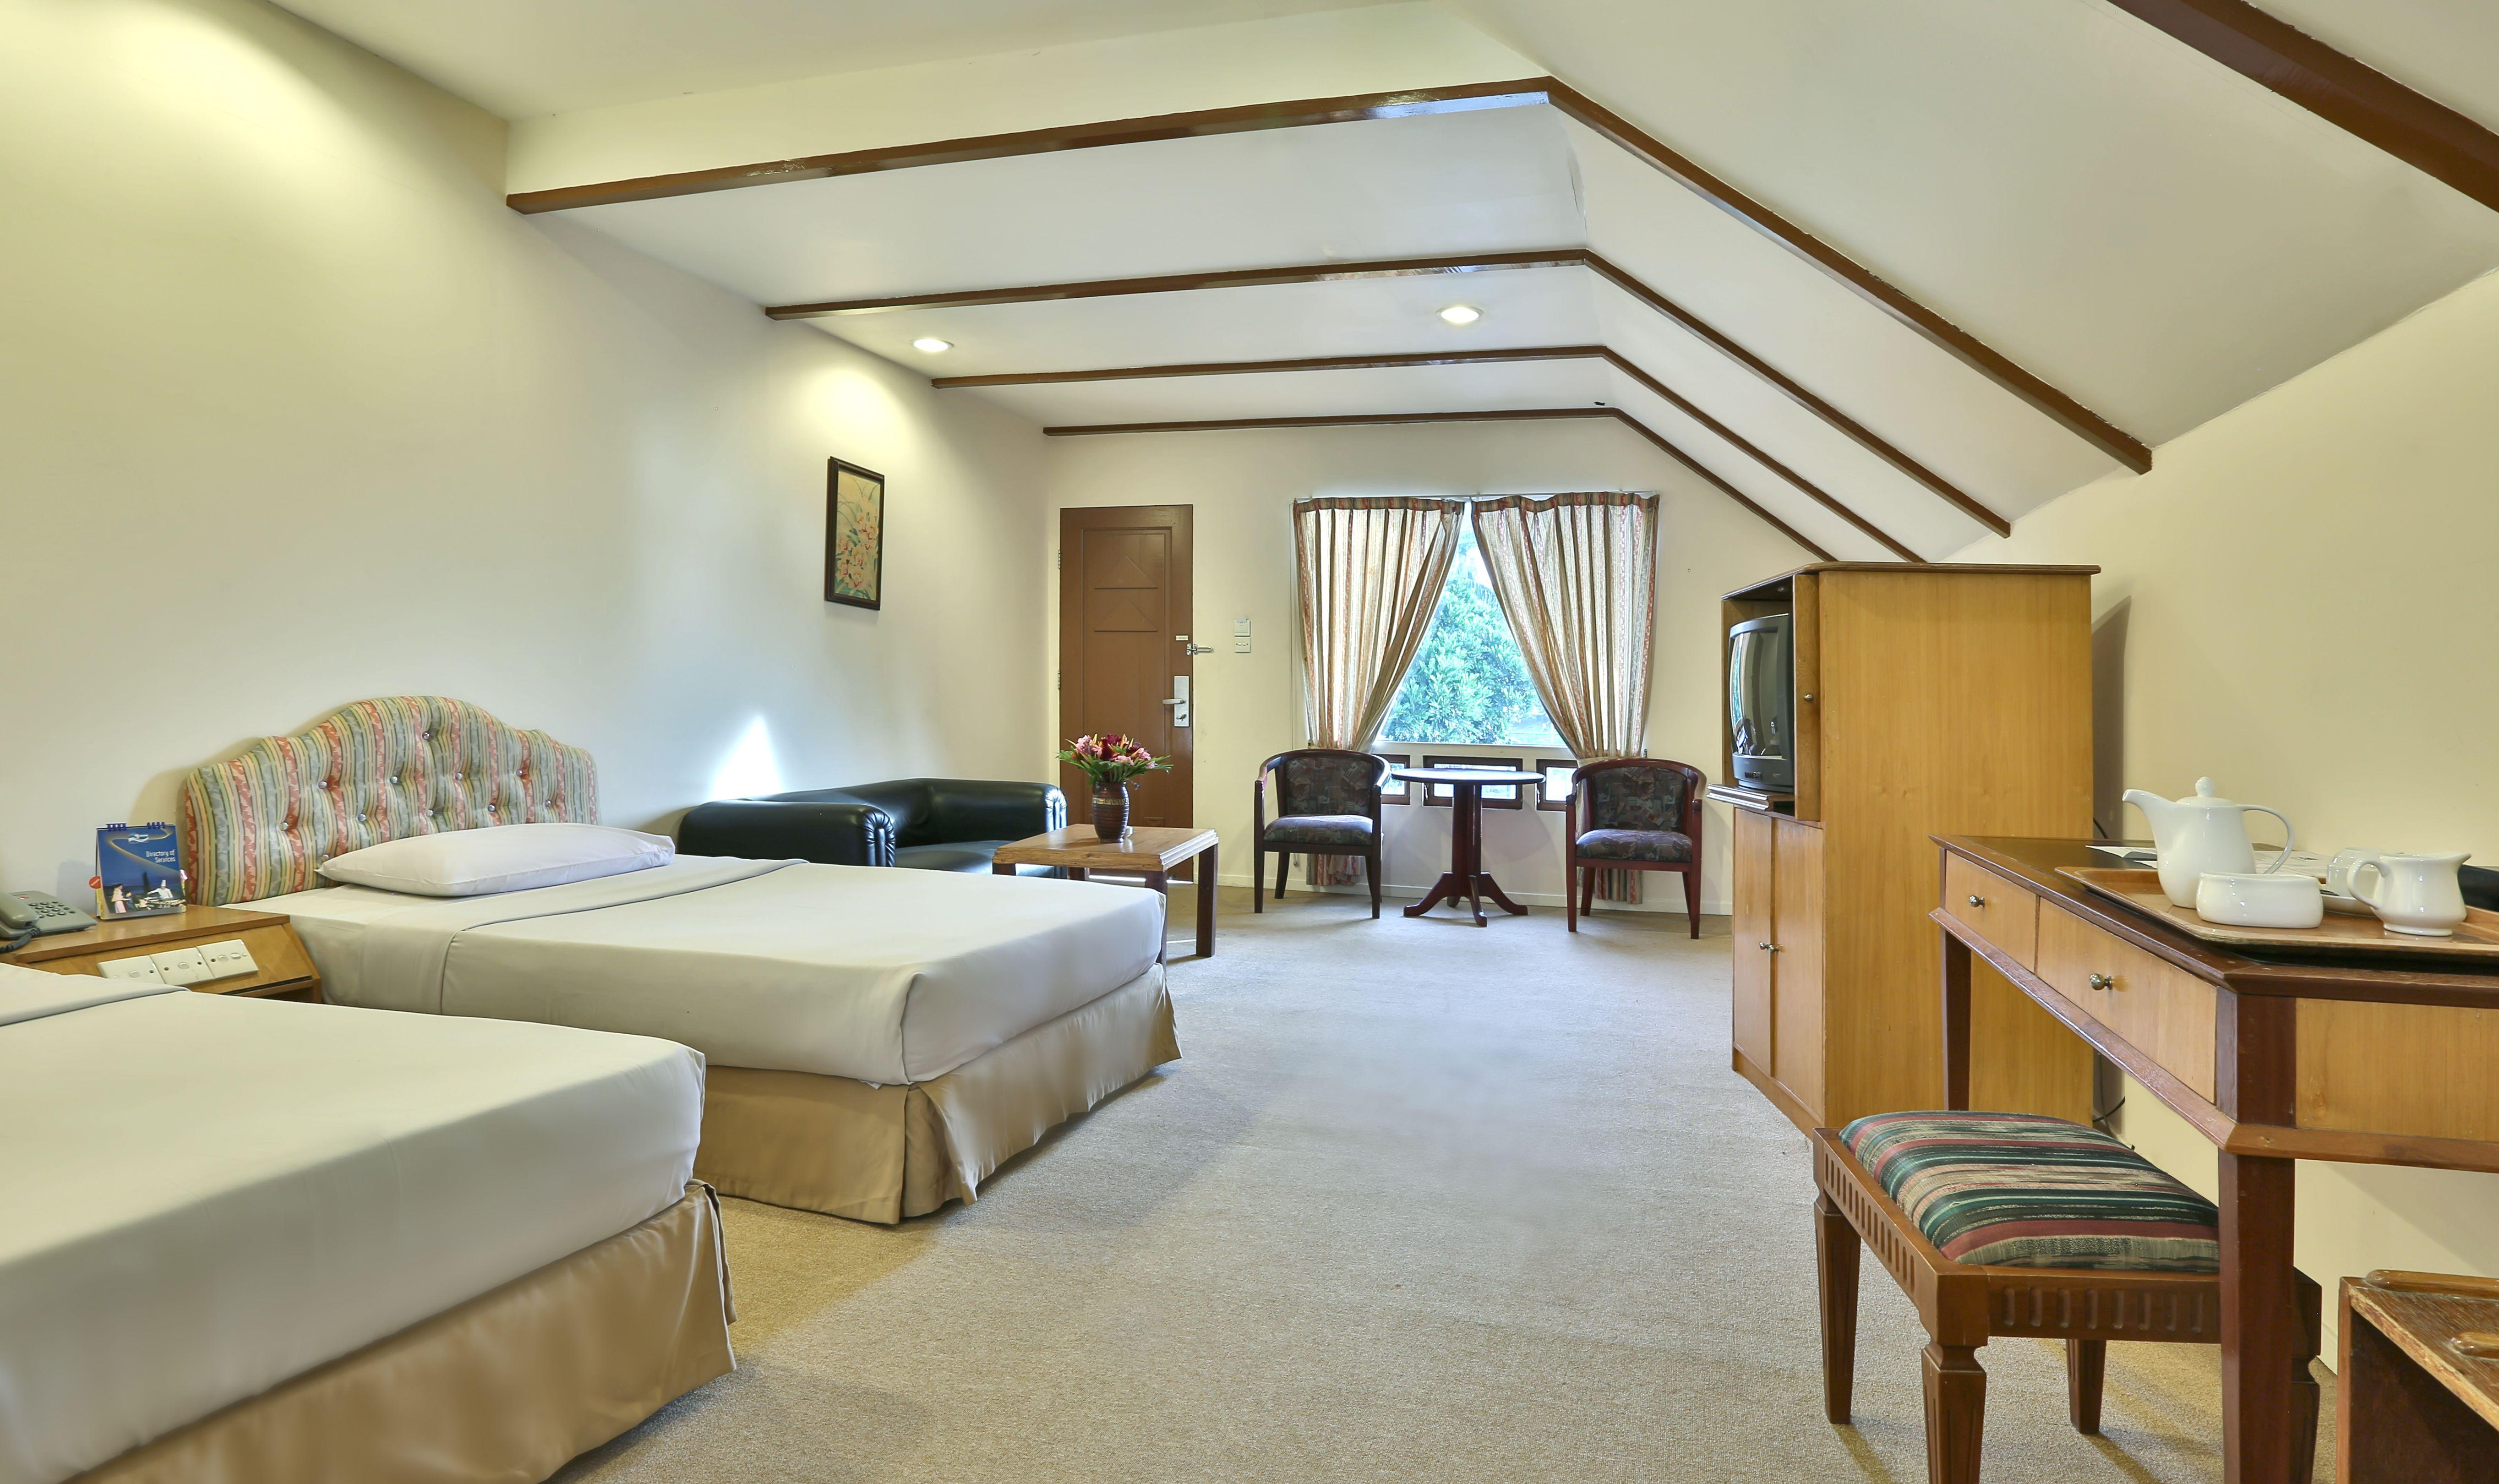 Niagara Hotel Lake Toba & Resort, Simalungun